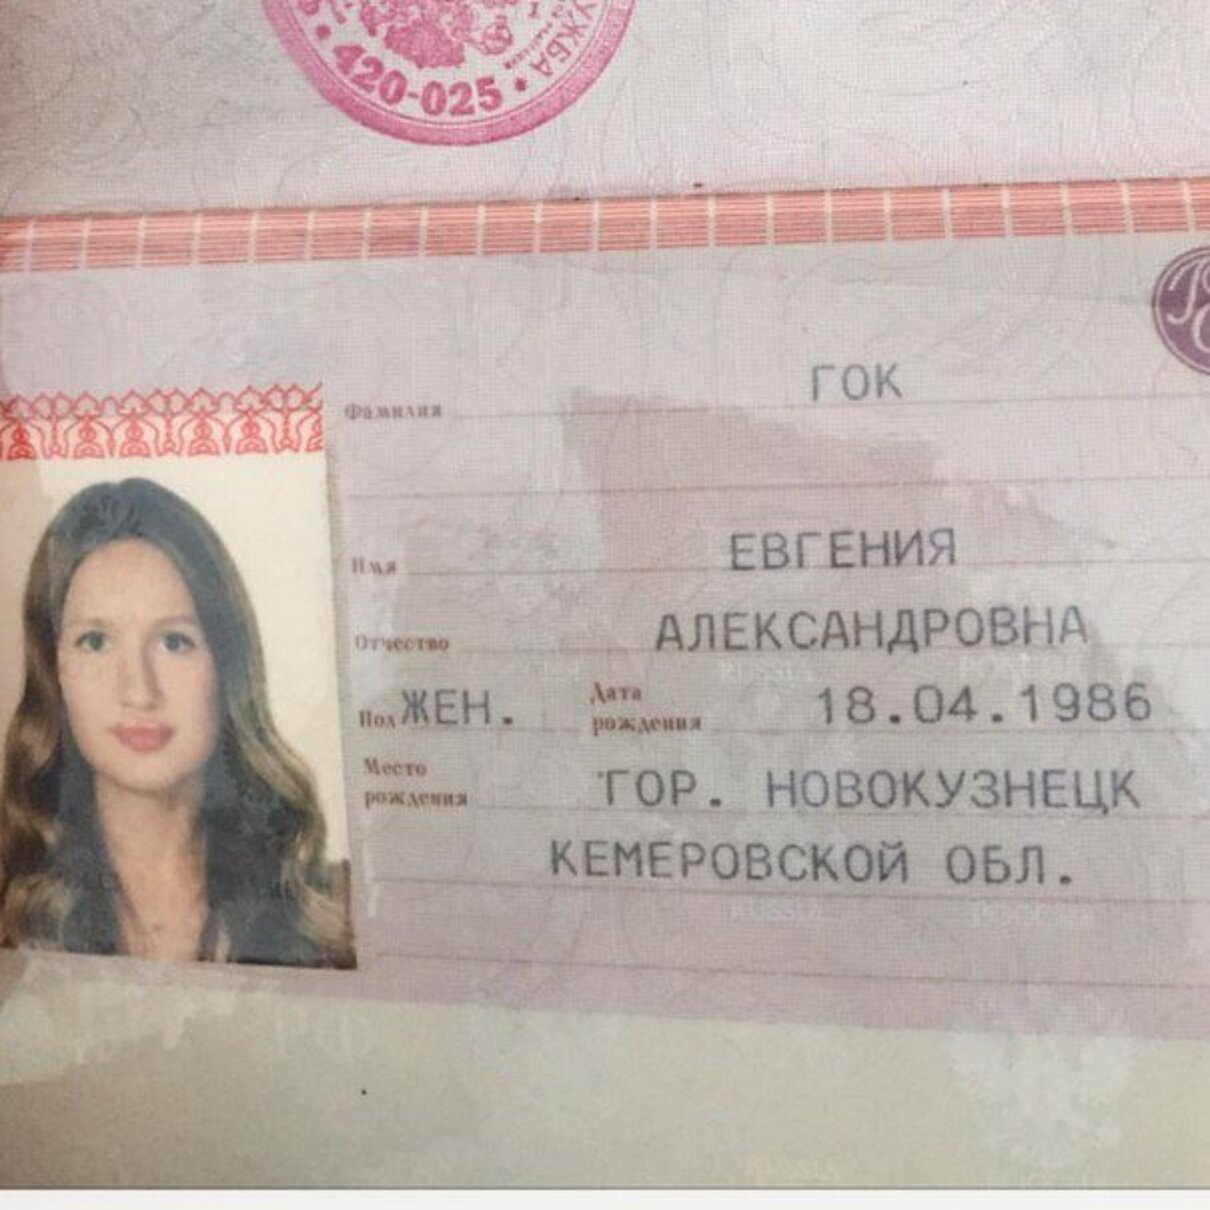 Жалоба-отзыв: Гок Евгения Александровна - Интернт-мошенник